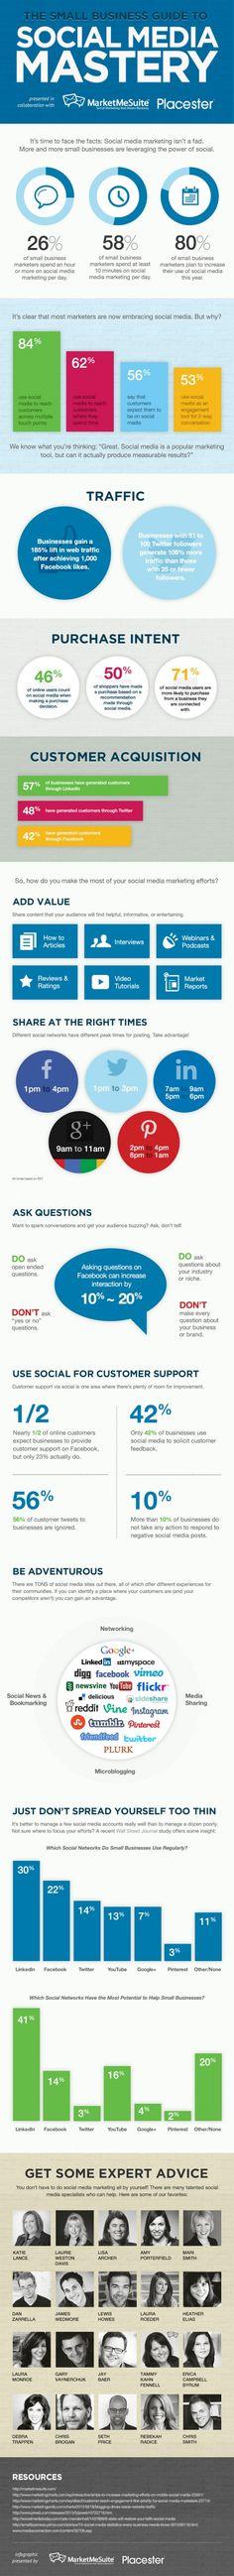 Mastering #socialmedia ! #SMM #infographic